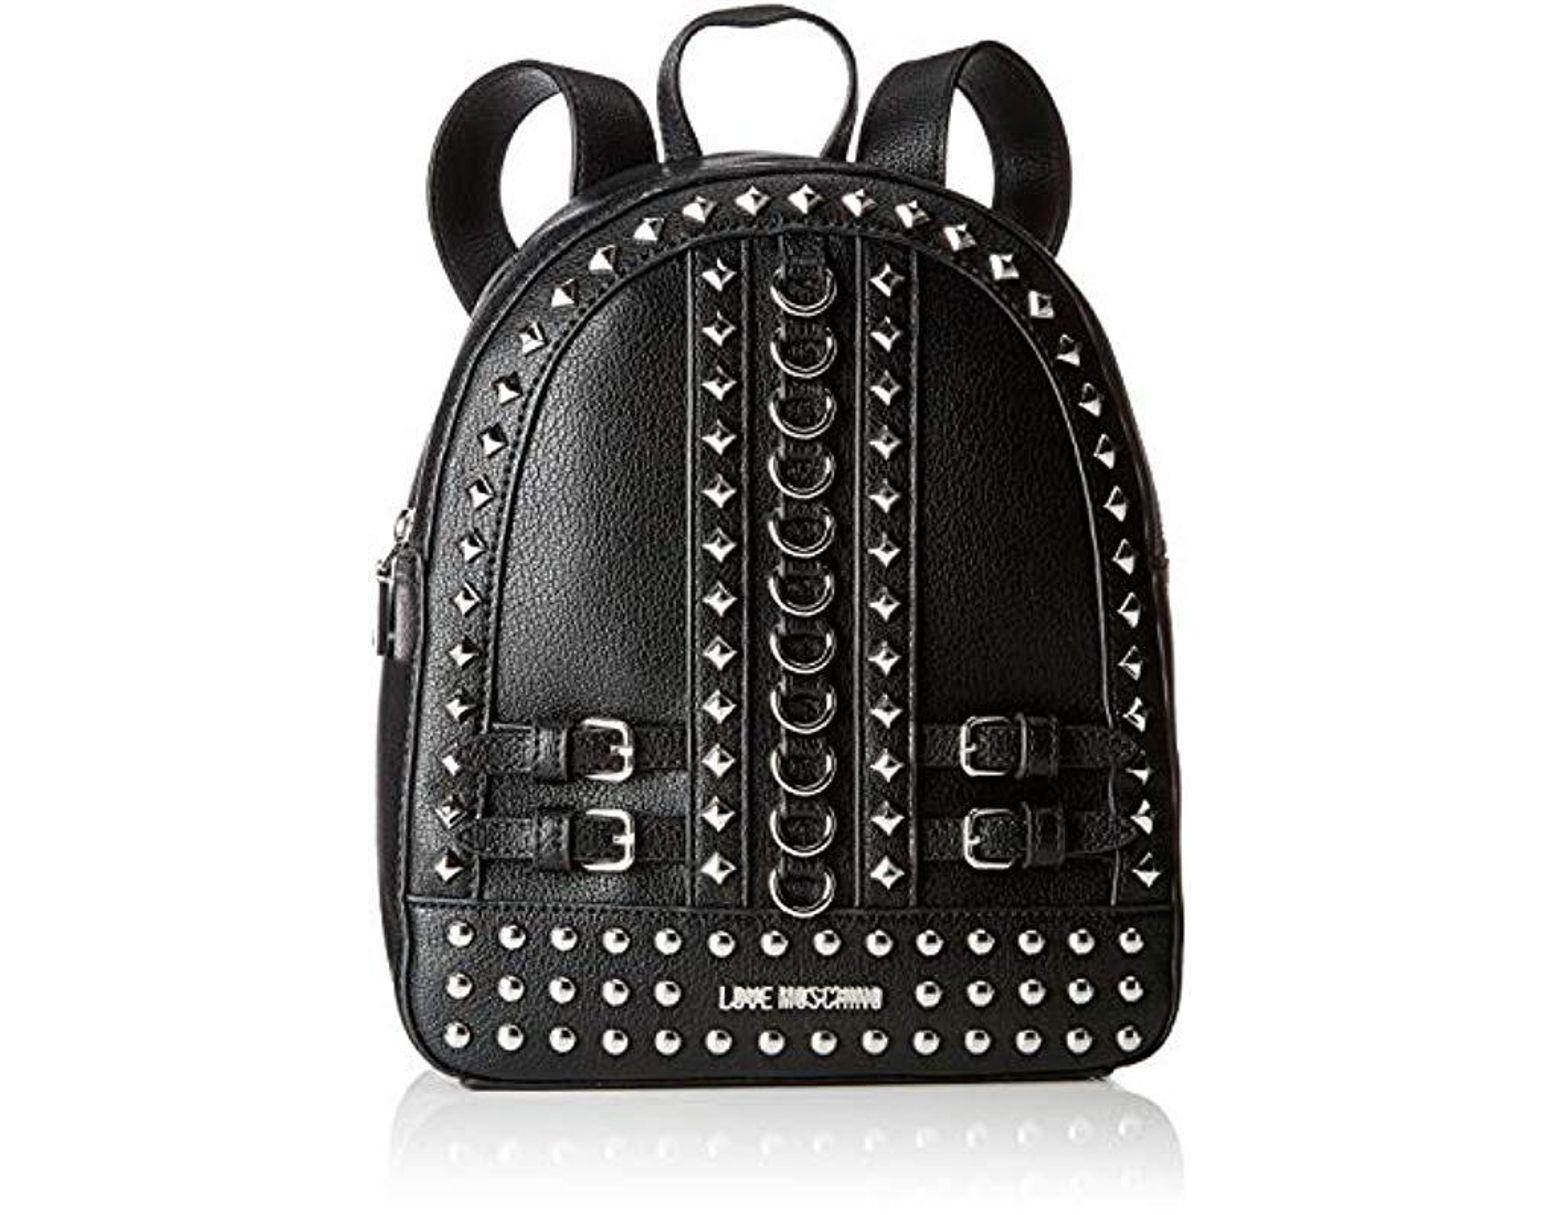 3d7d596ffaf Love Moschino Borsa Pebble Grain Pu Backpack Handbag in Black - Save 31% -  Lyst